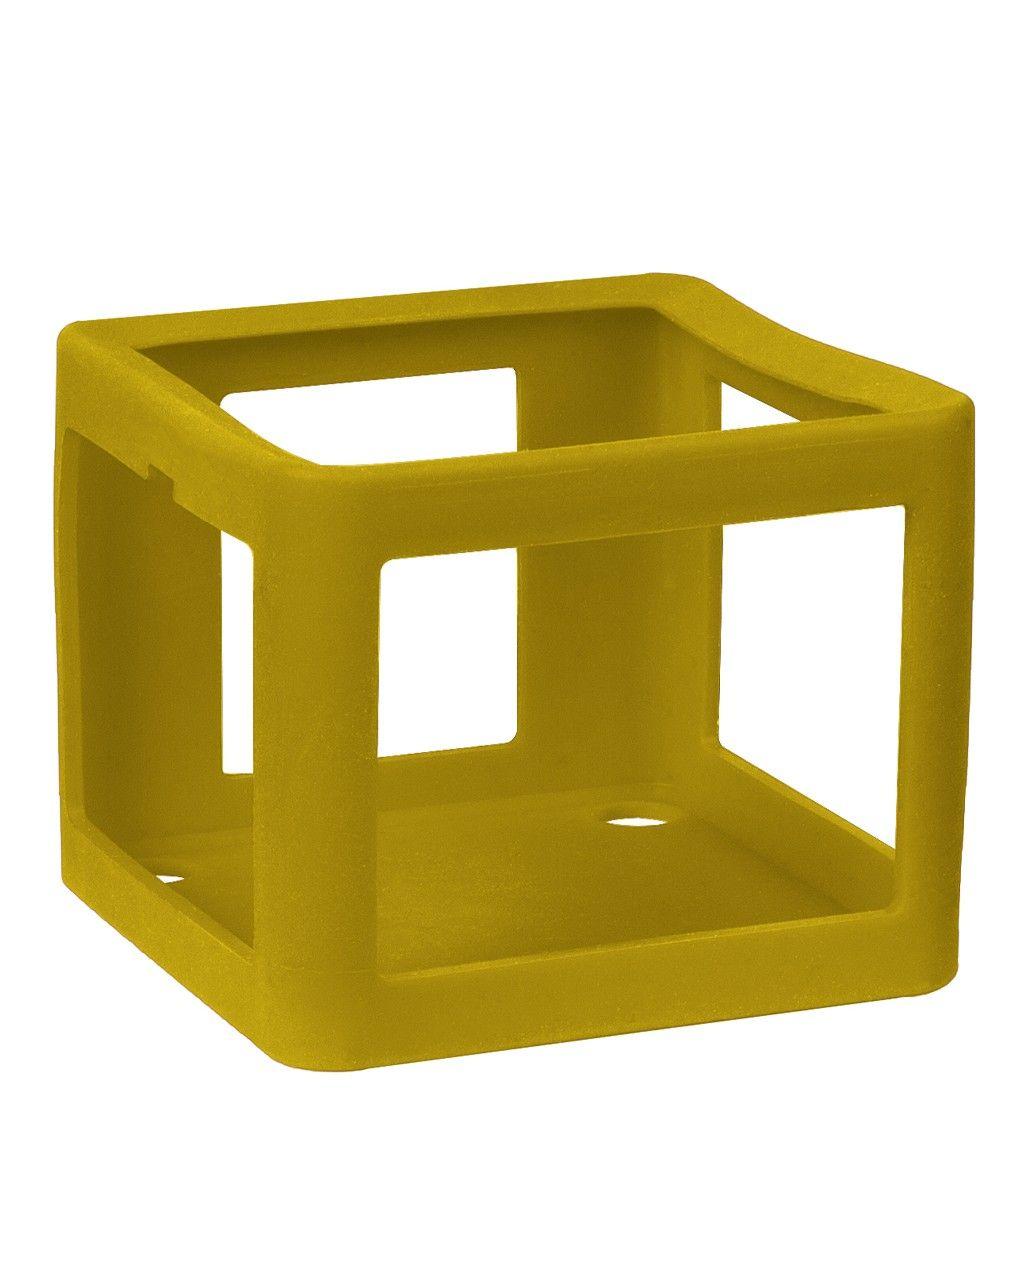 Faba - guscio protettivo in silicone - giallo - Faba